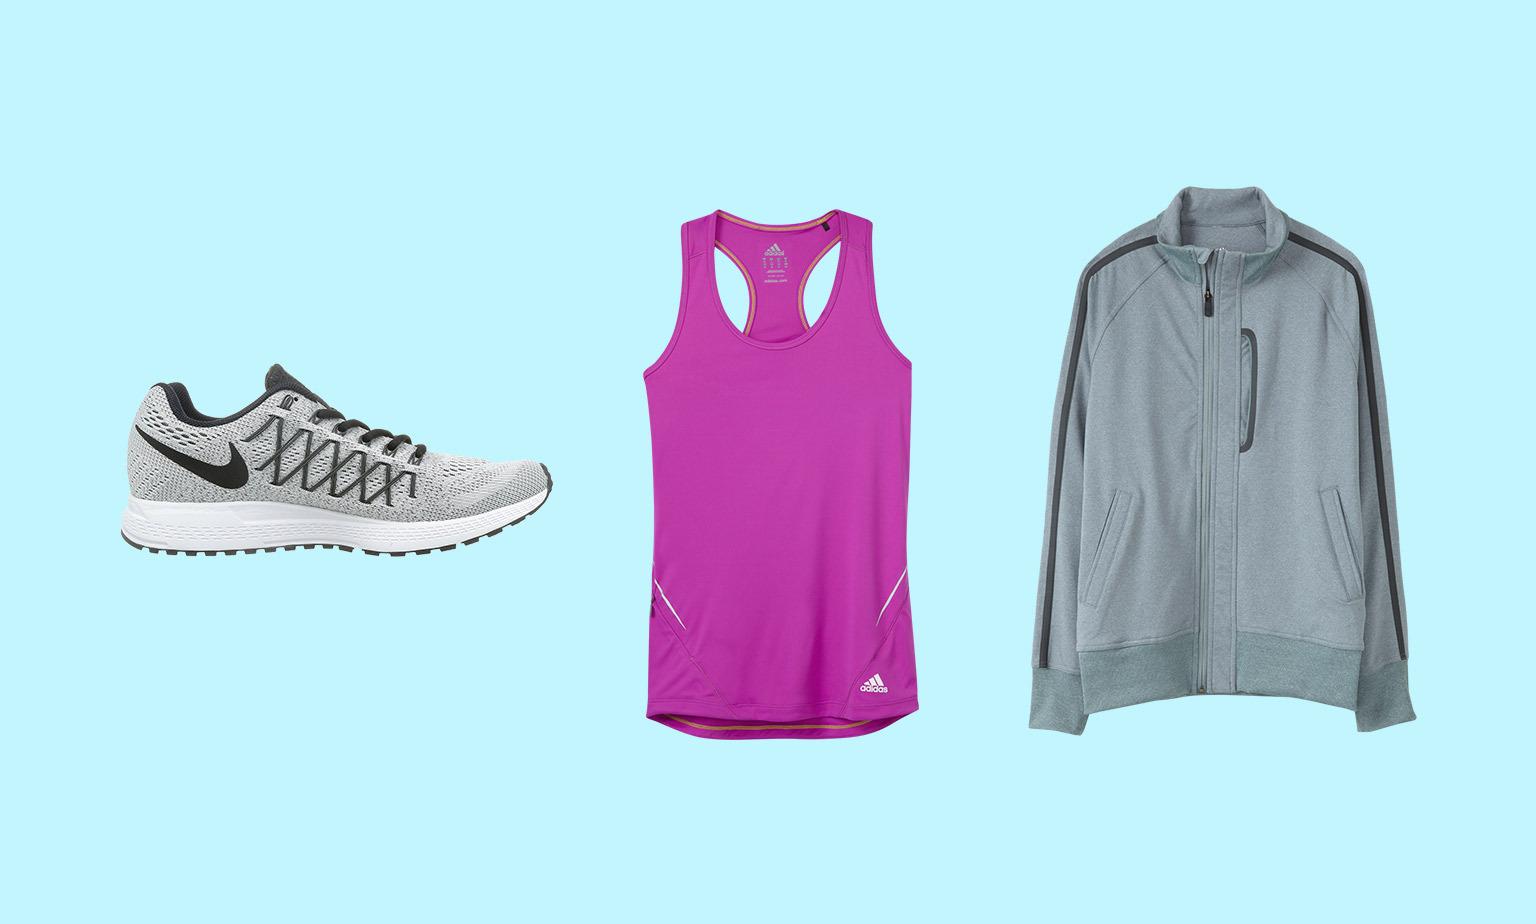 Top Brands in Athletic Apparel